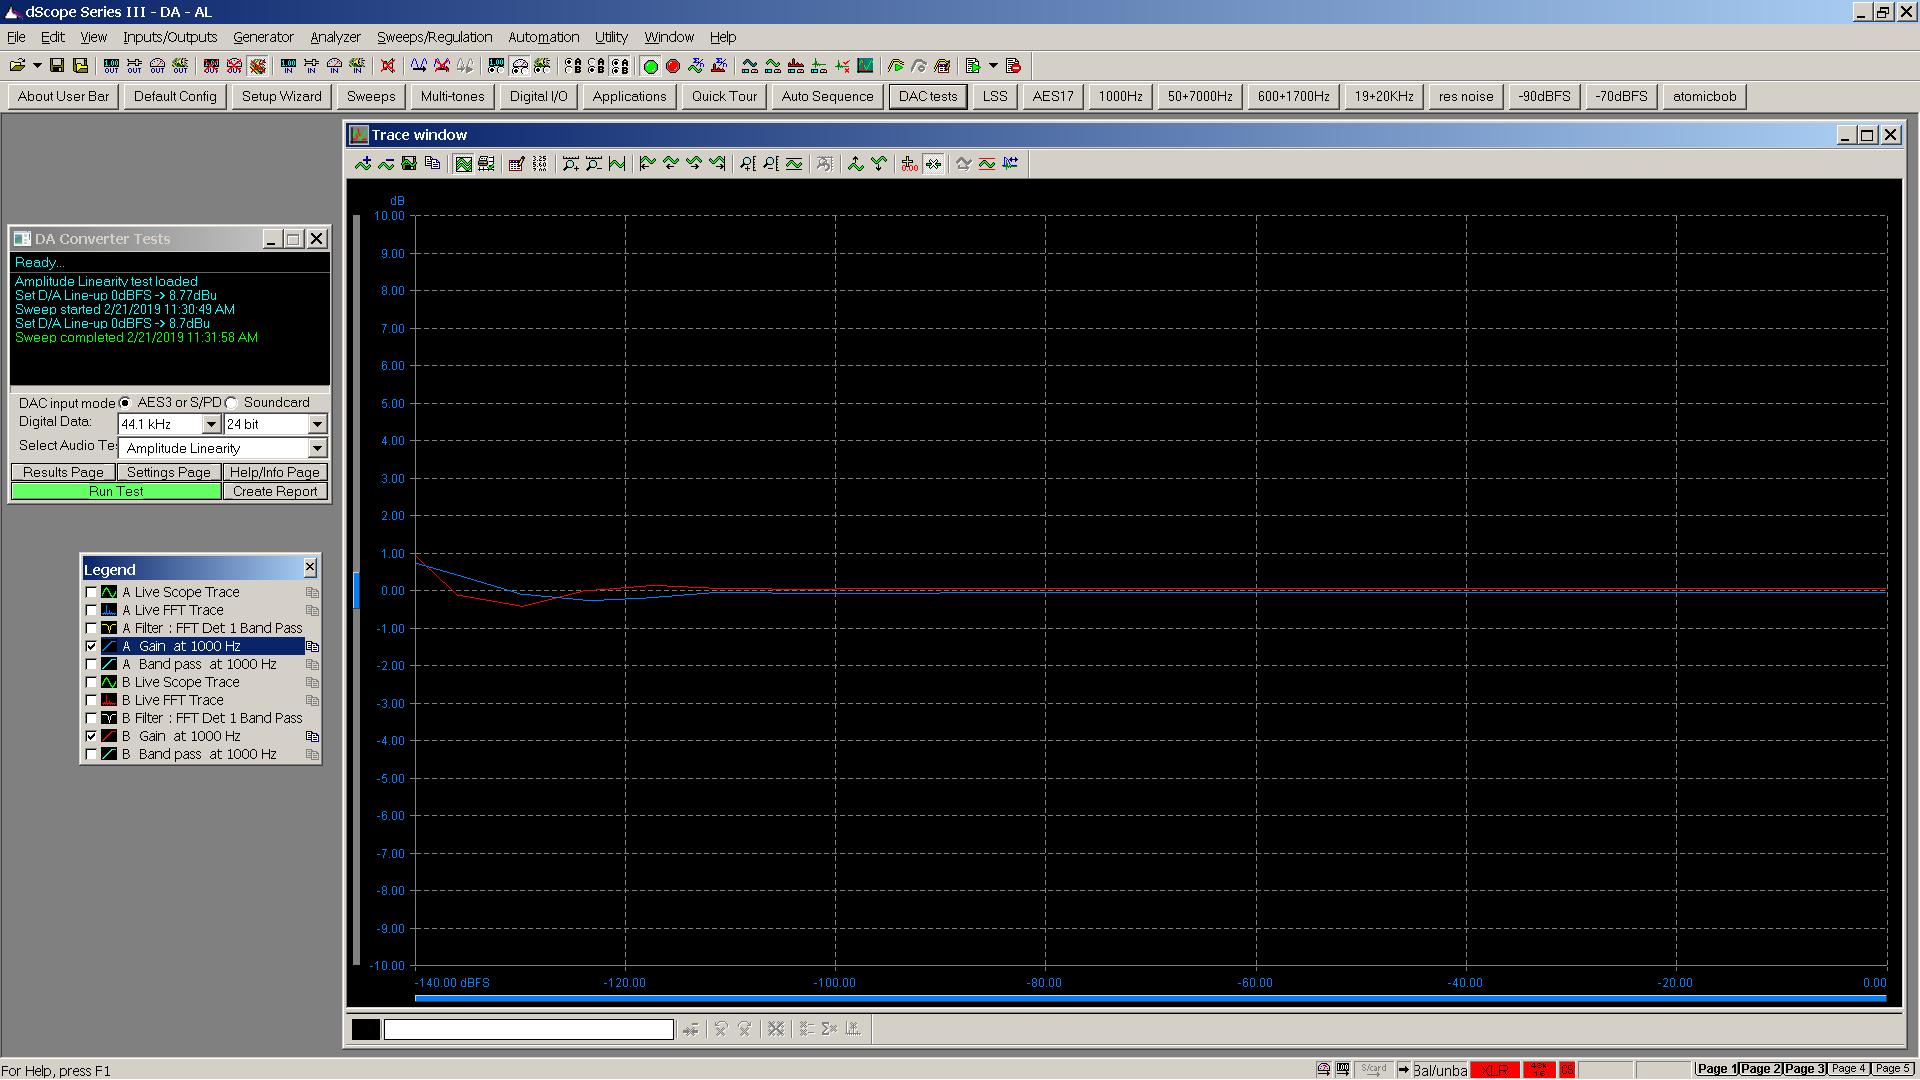 20190221 DSHA-3F 1 KHz gain linearity 300R.PNG